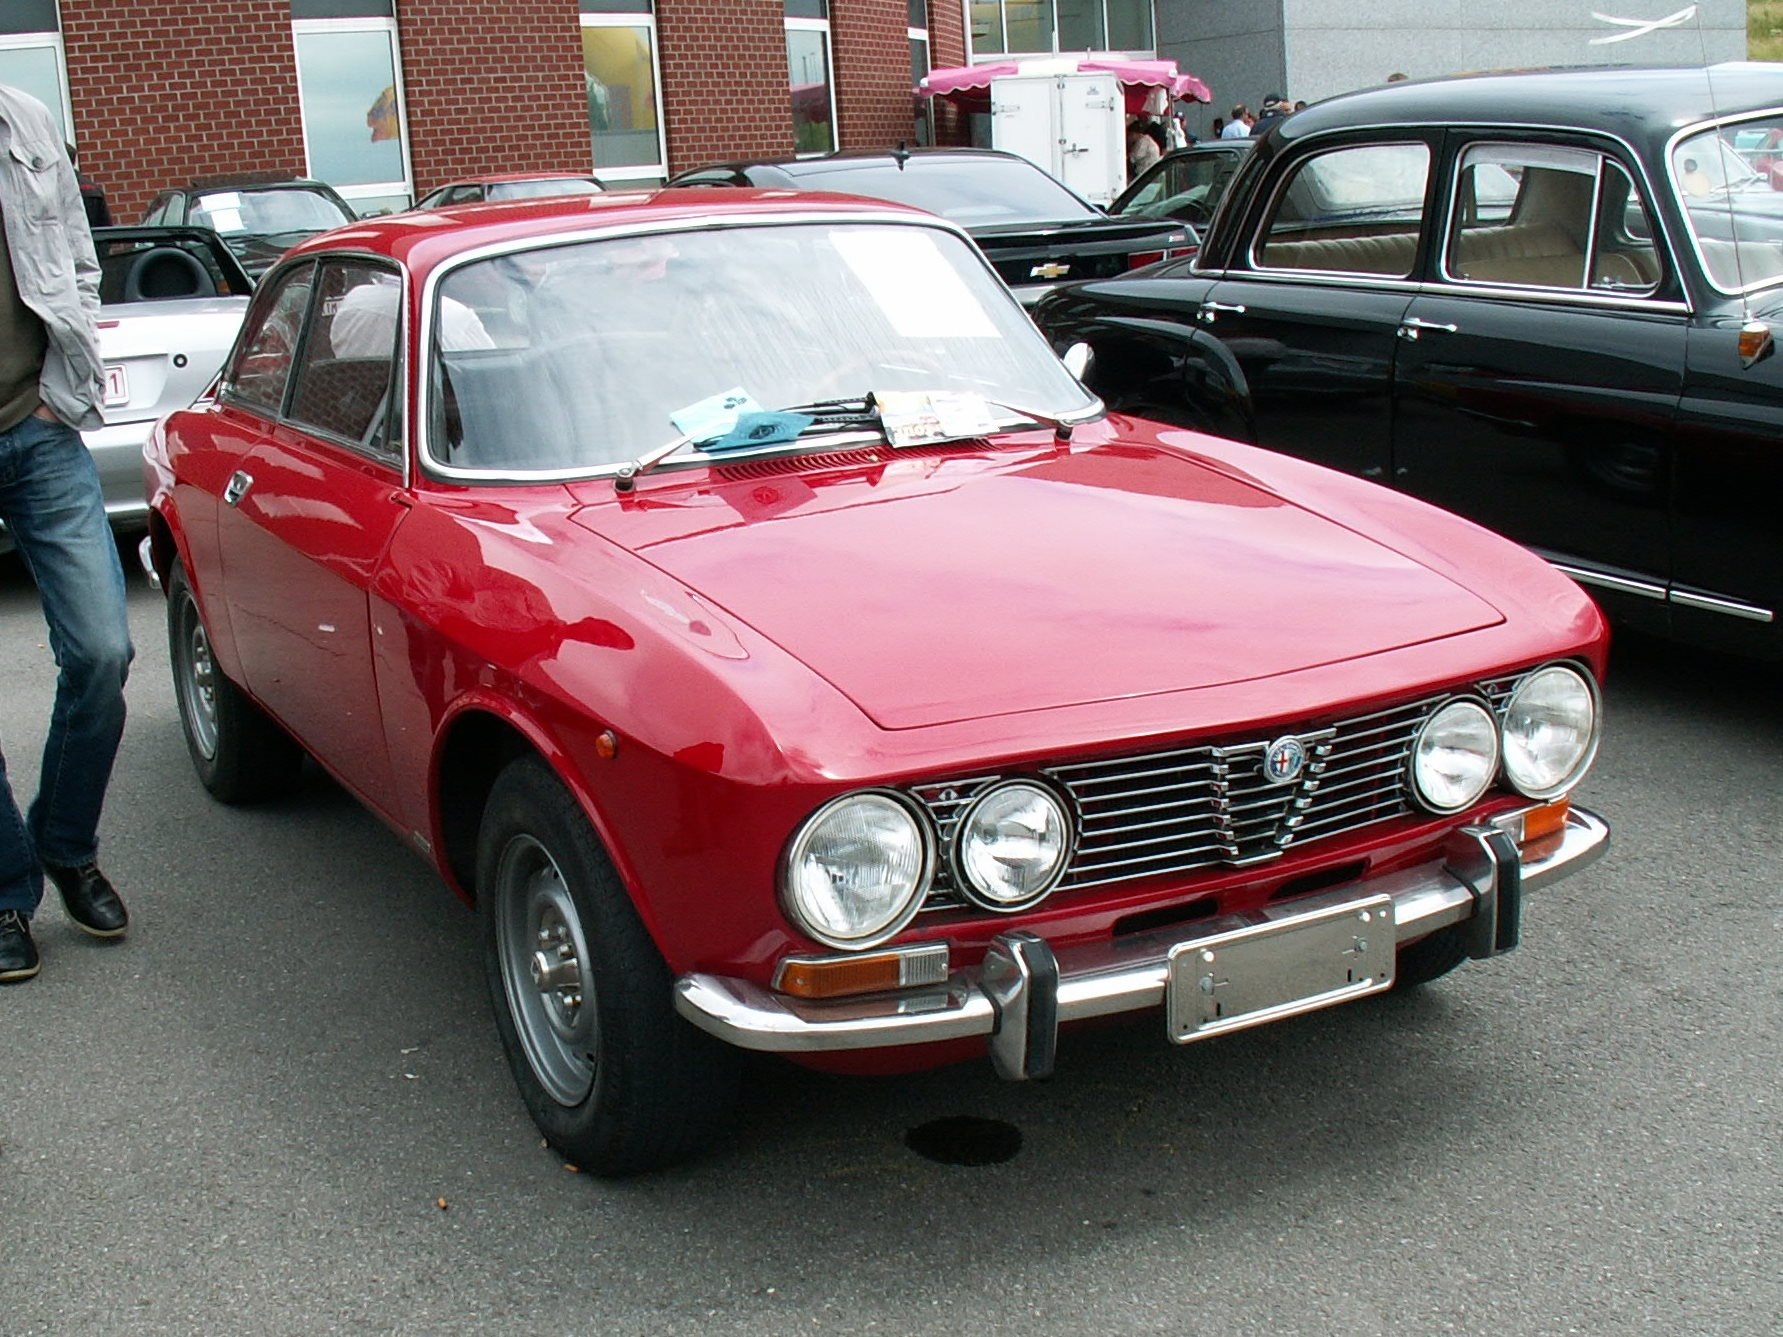 Tamiya Alfa Romeo Gtv moreover 3404003520 additionally 4850 besides  furthermore . on alfa gtv